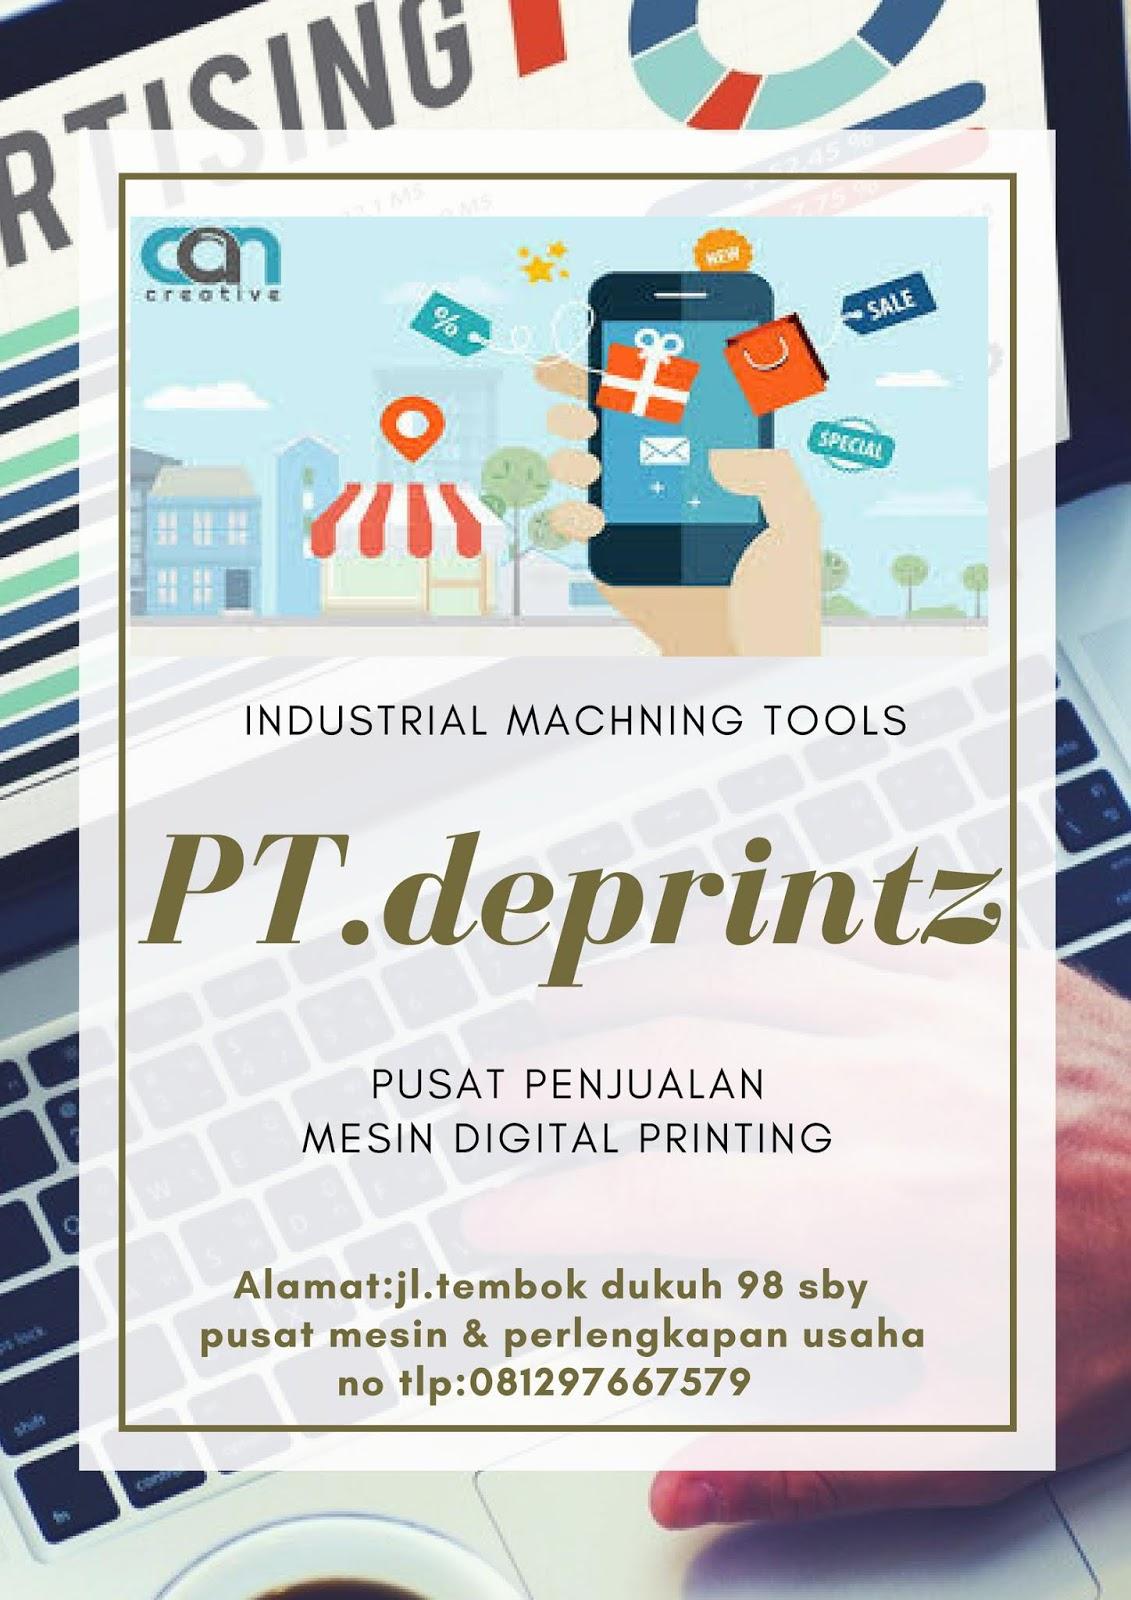 Bisnis Iklan Digital Workshop Digital Printing